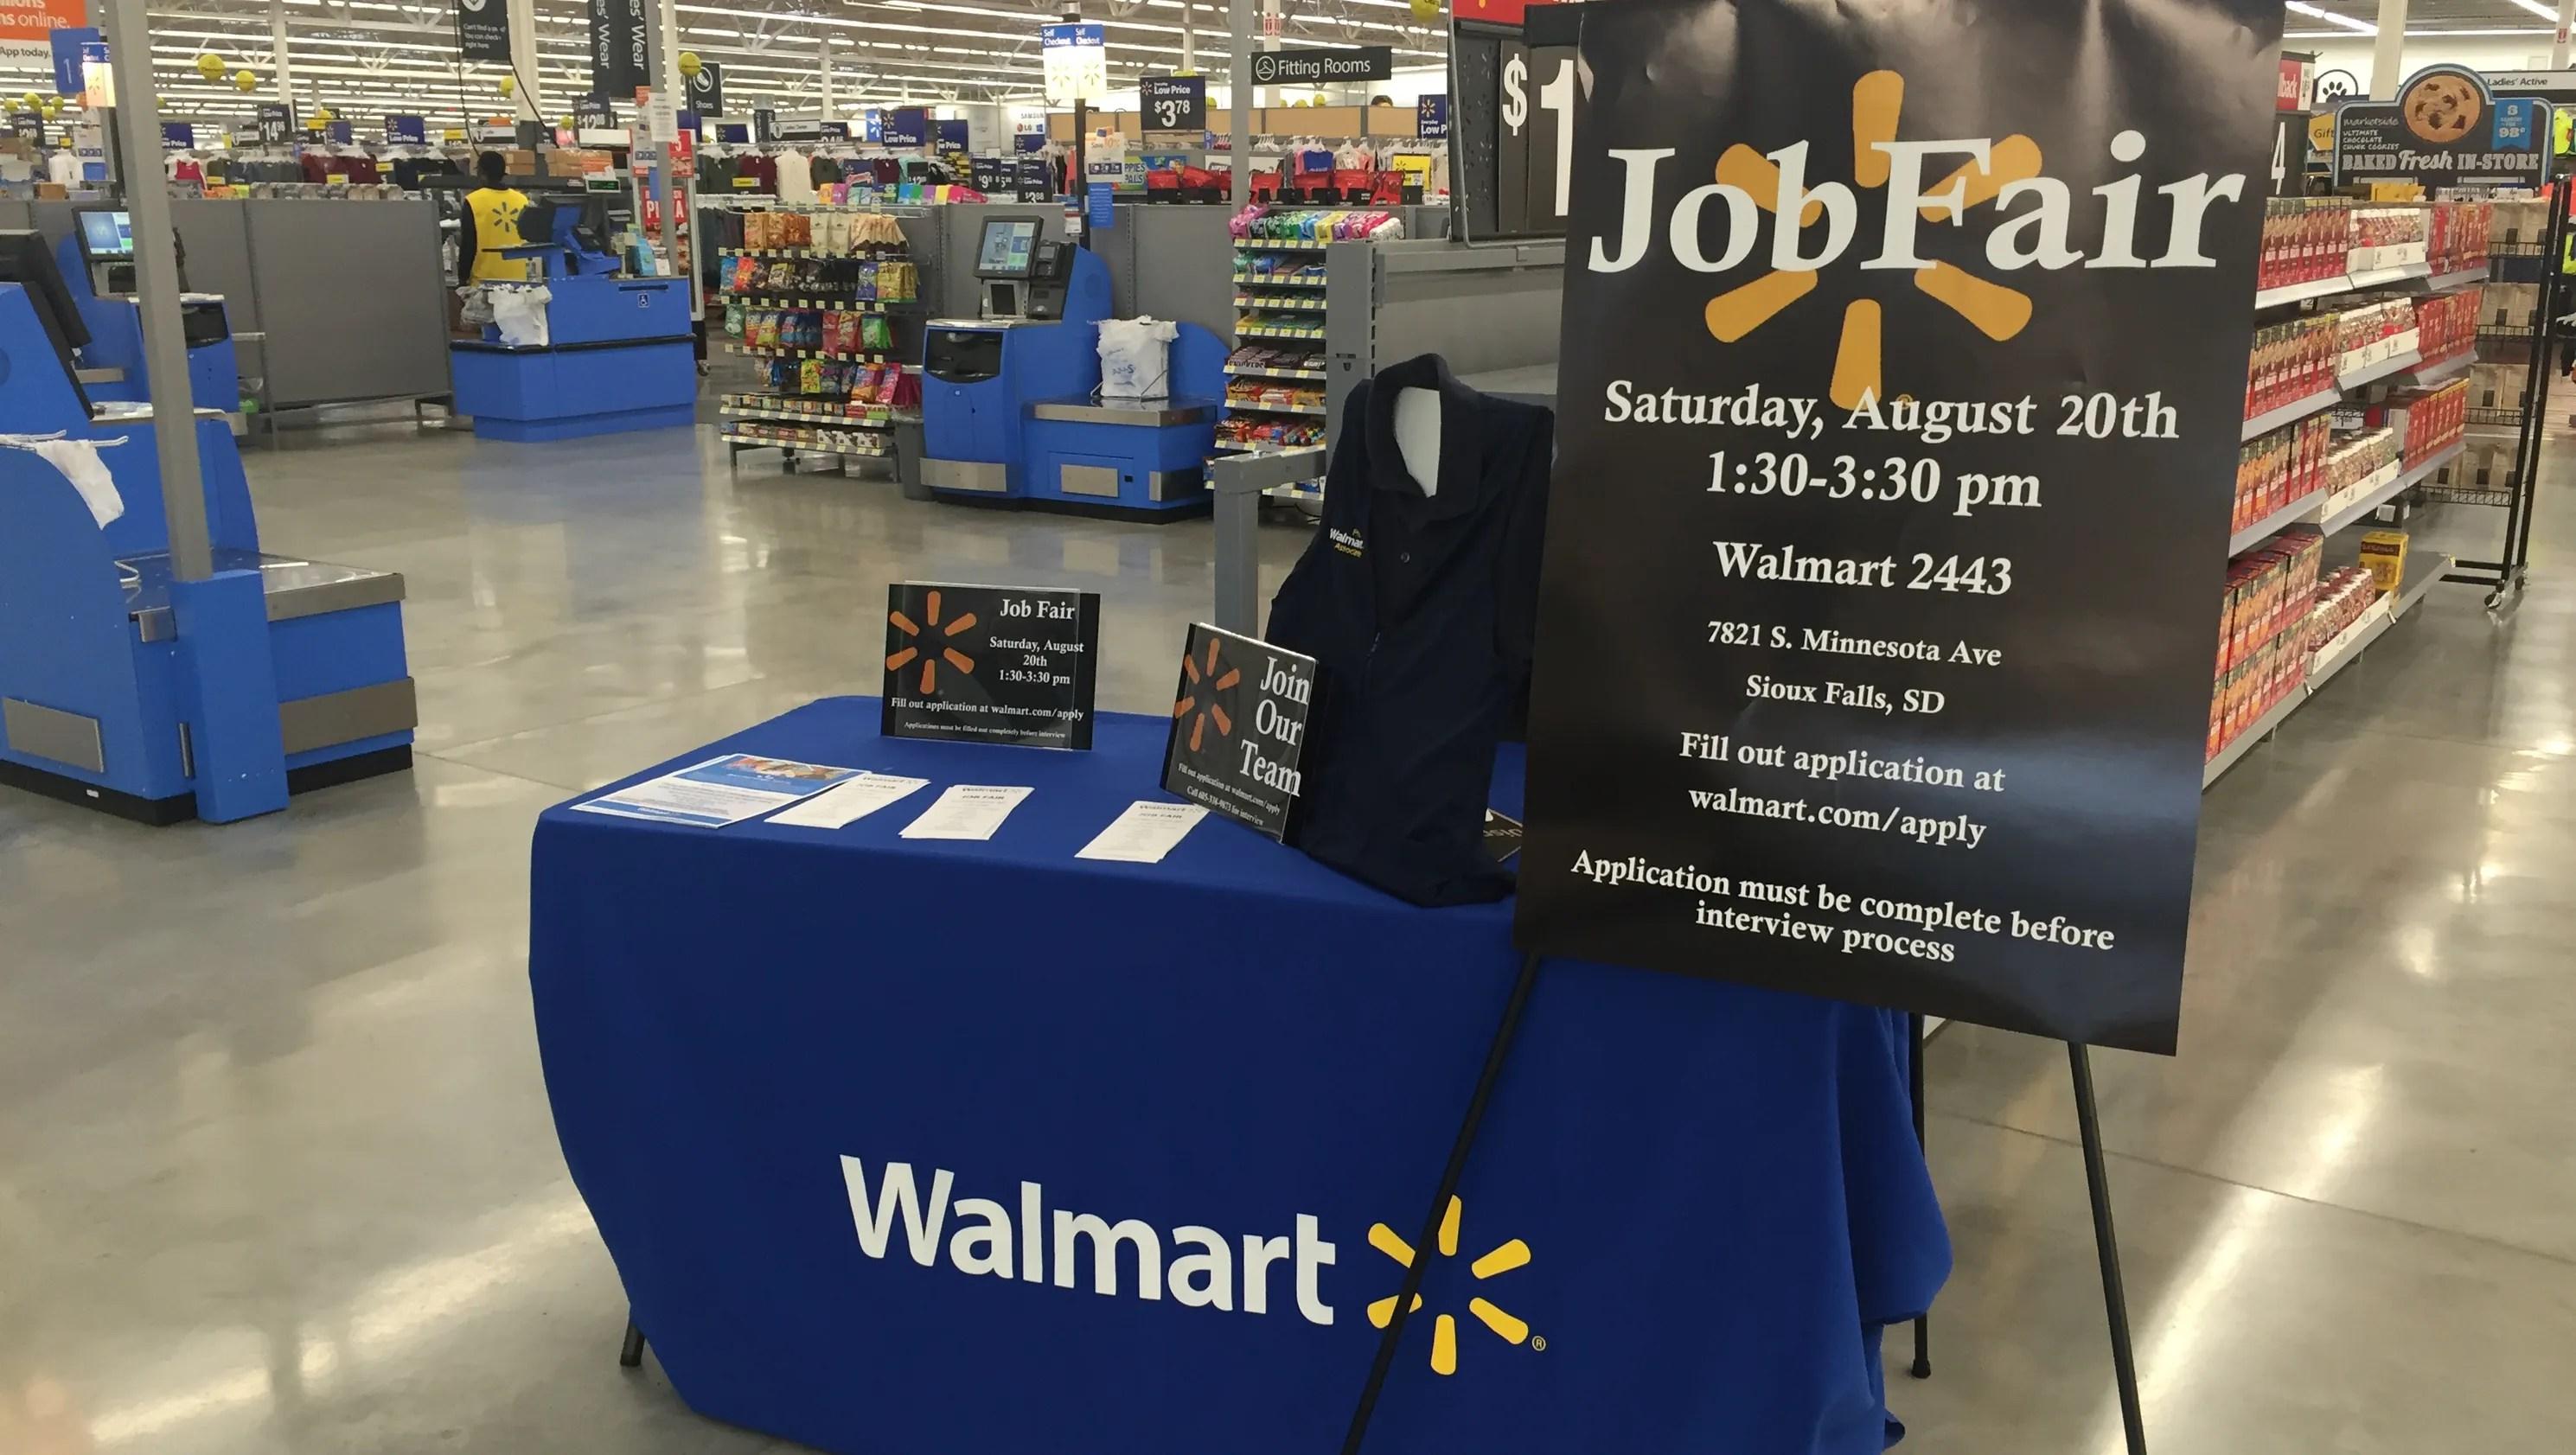 Walmart holding job fair Saturday